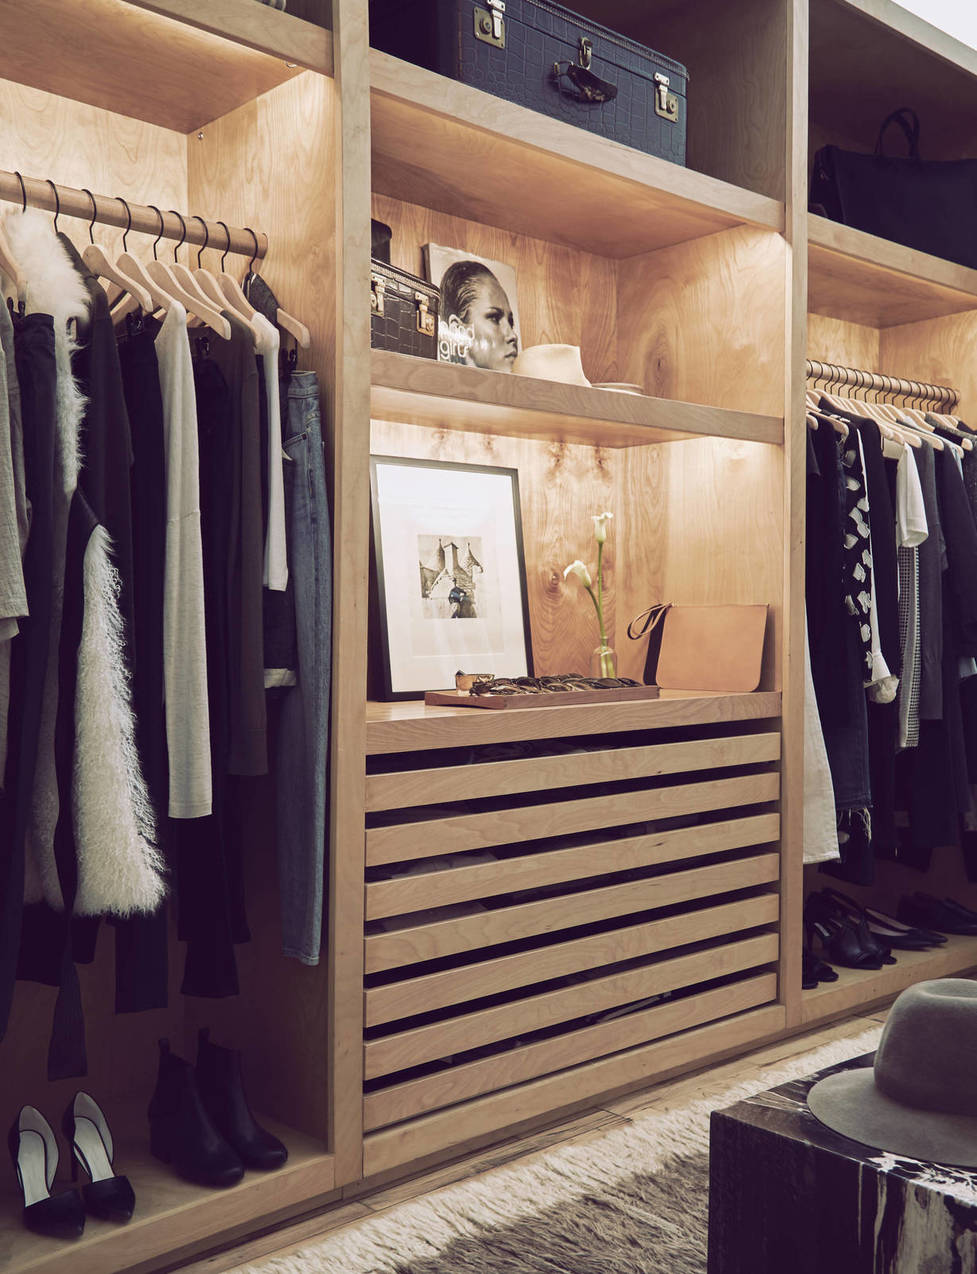 medium_APT_closet-23x30.jpg